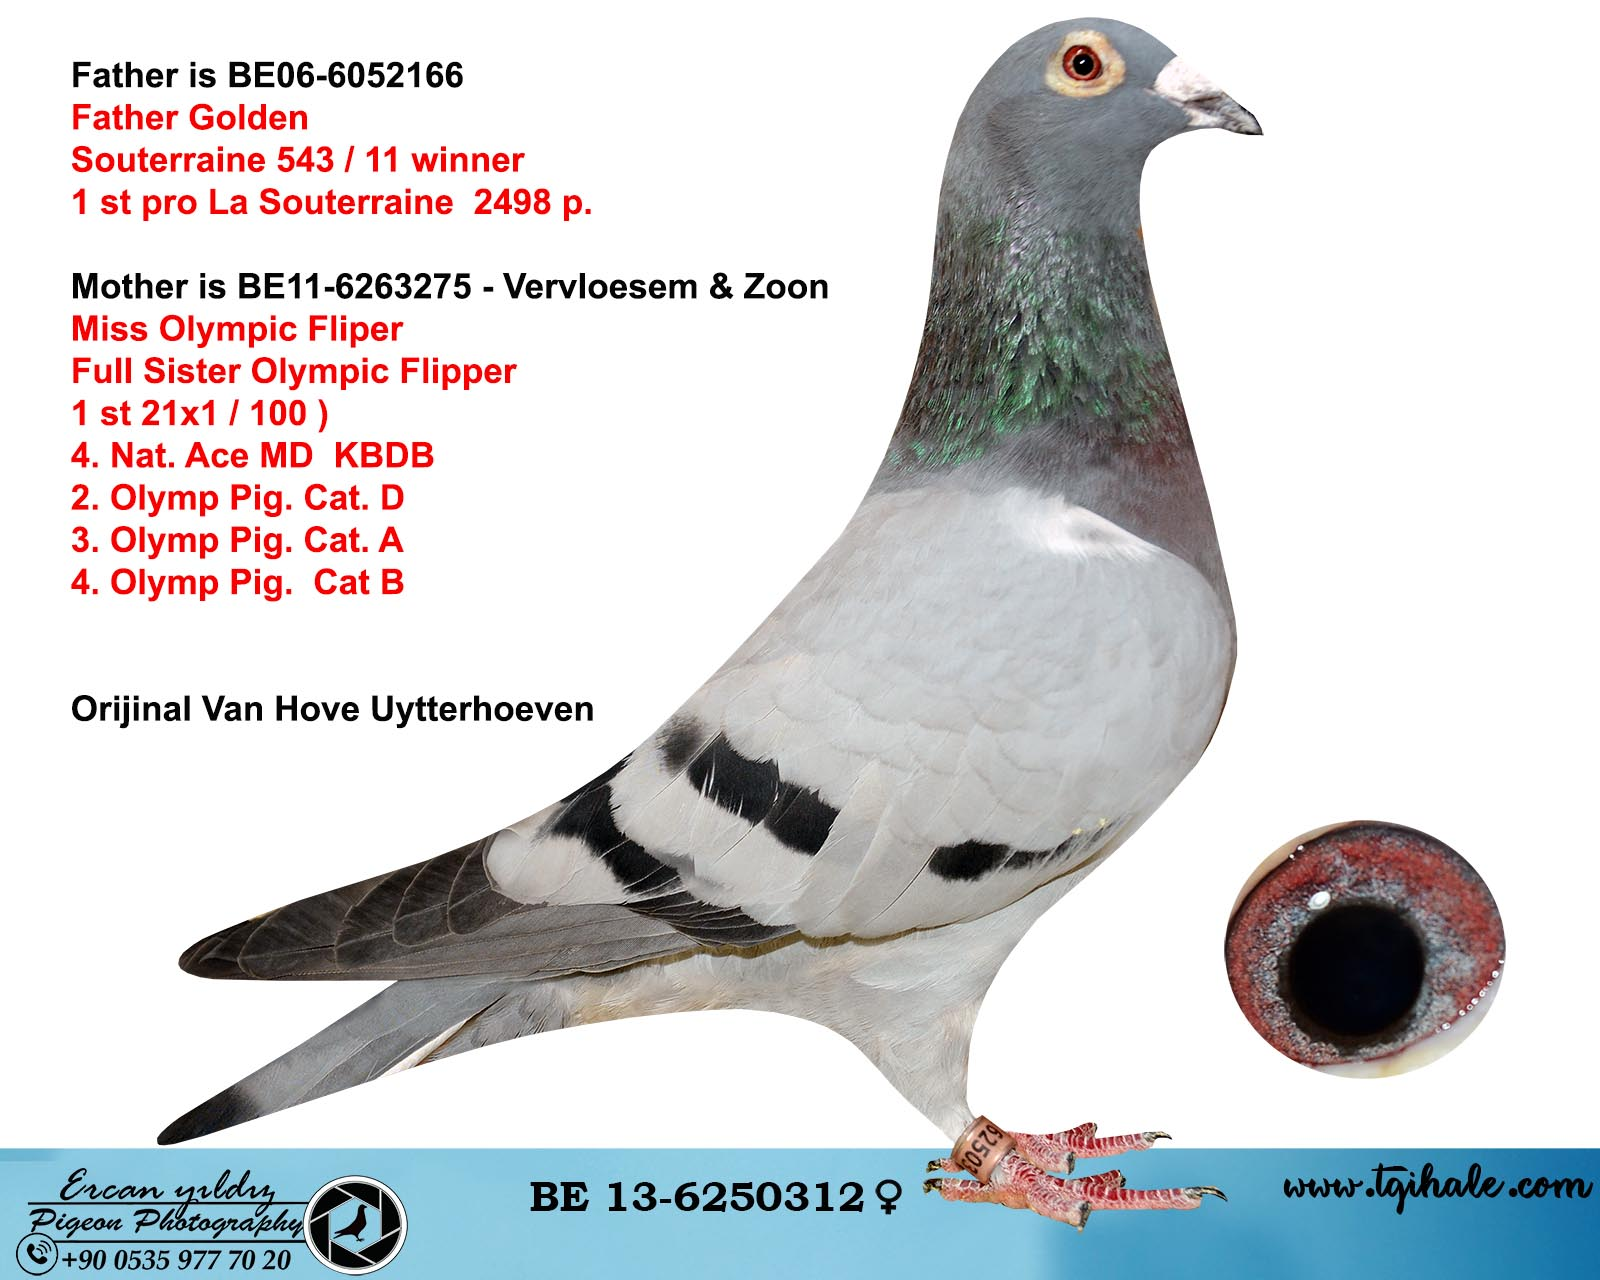 BE13-6250312 DİŞİ / ORJ VAN HOVE UYTTERHOEVEN